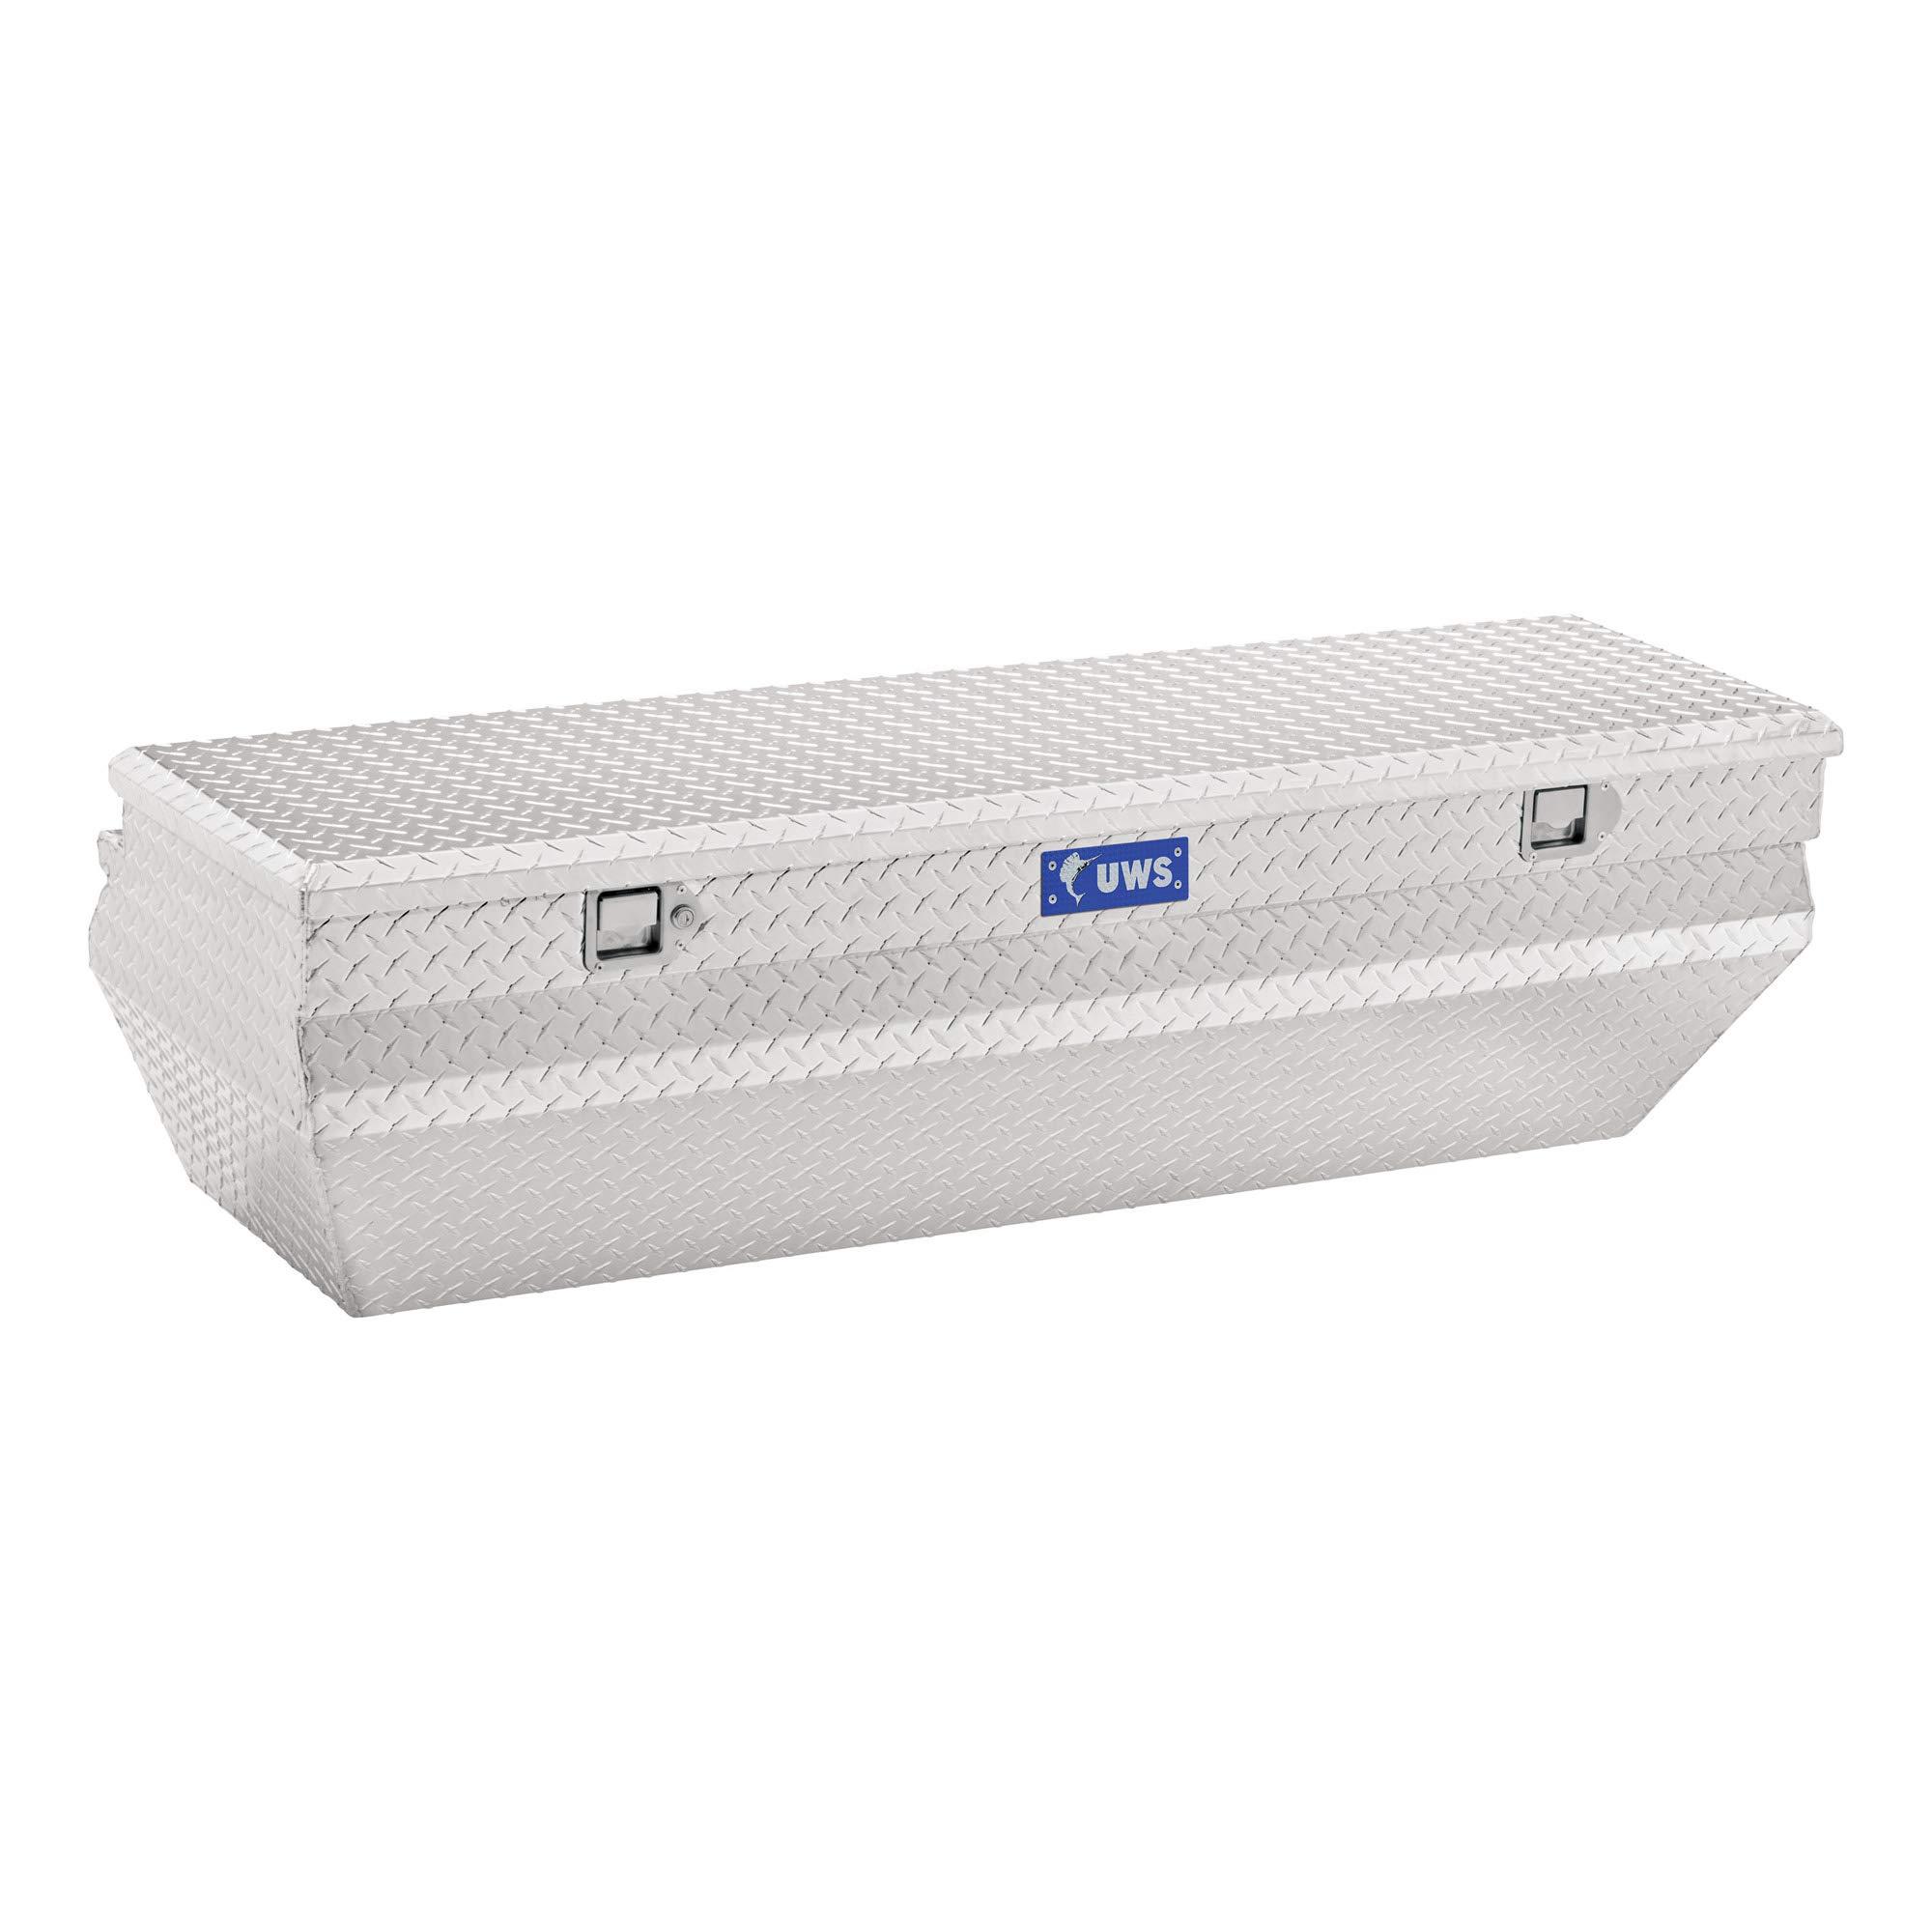 UWS EC20311 55-Inch Heavy-Wall Aluminum Wedge Angled Truck Storage Box, RigidCore Lid